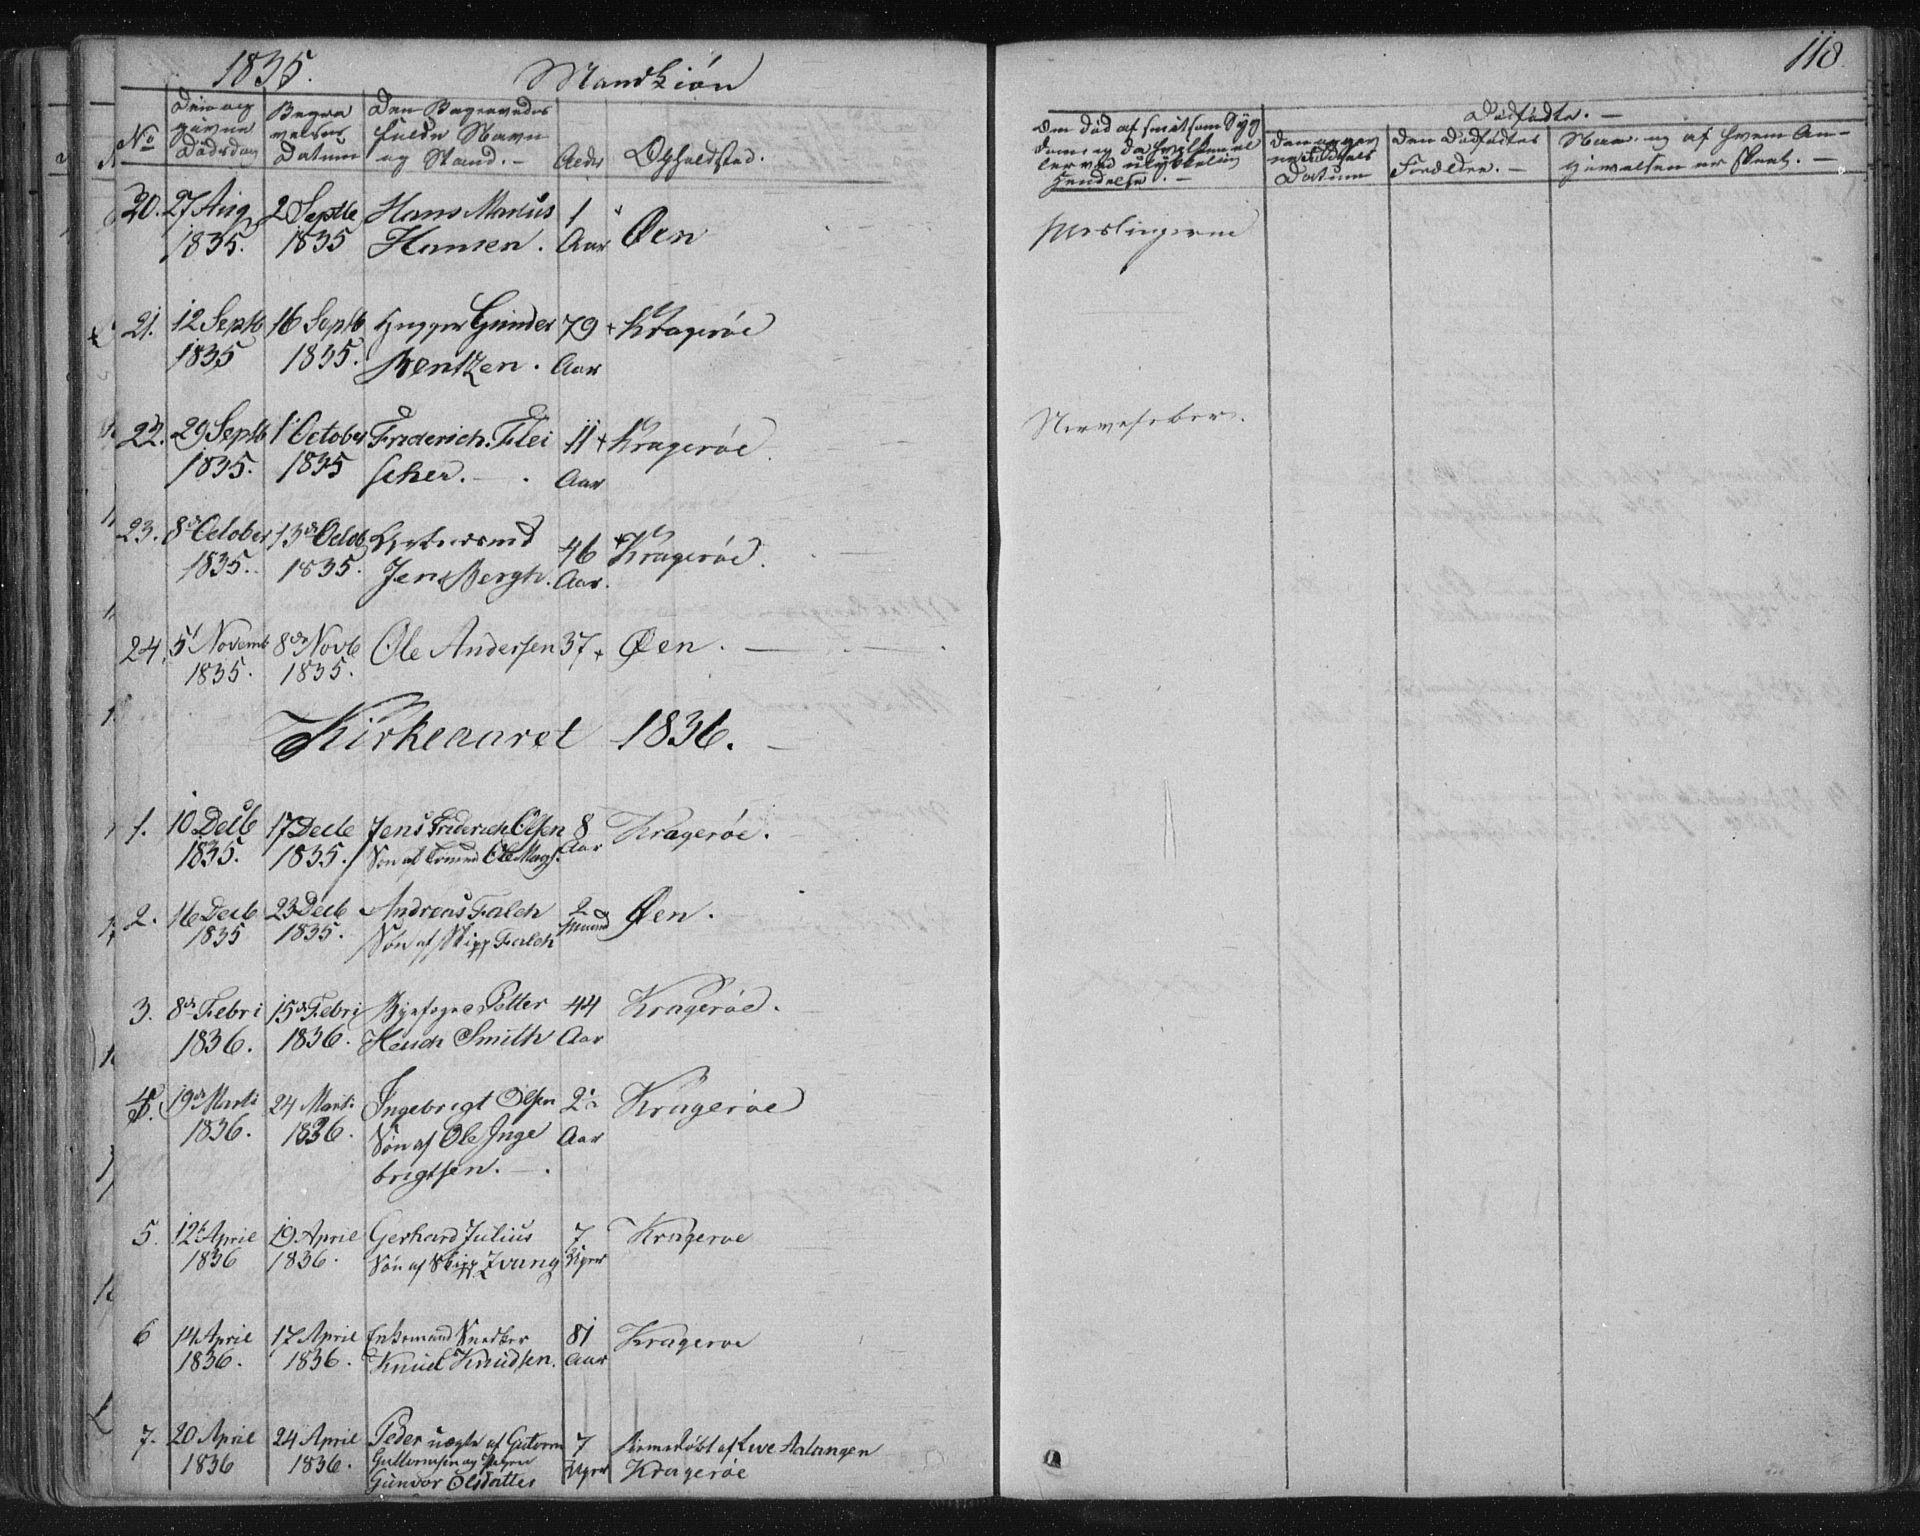 SAKO, Kragerø kirkebøker, F/Fa/L0005: Ministerialbok nr. 5, 1832-1847, s. 118